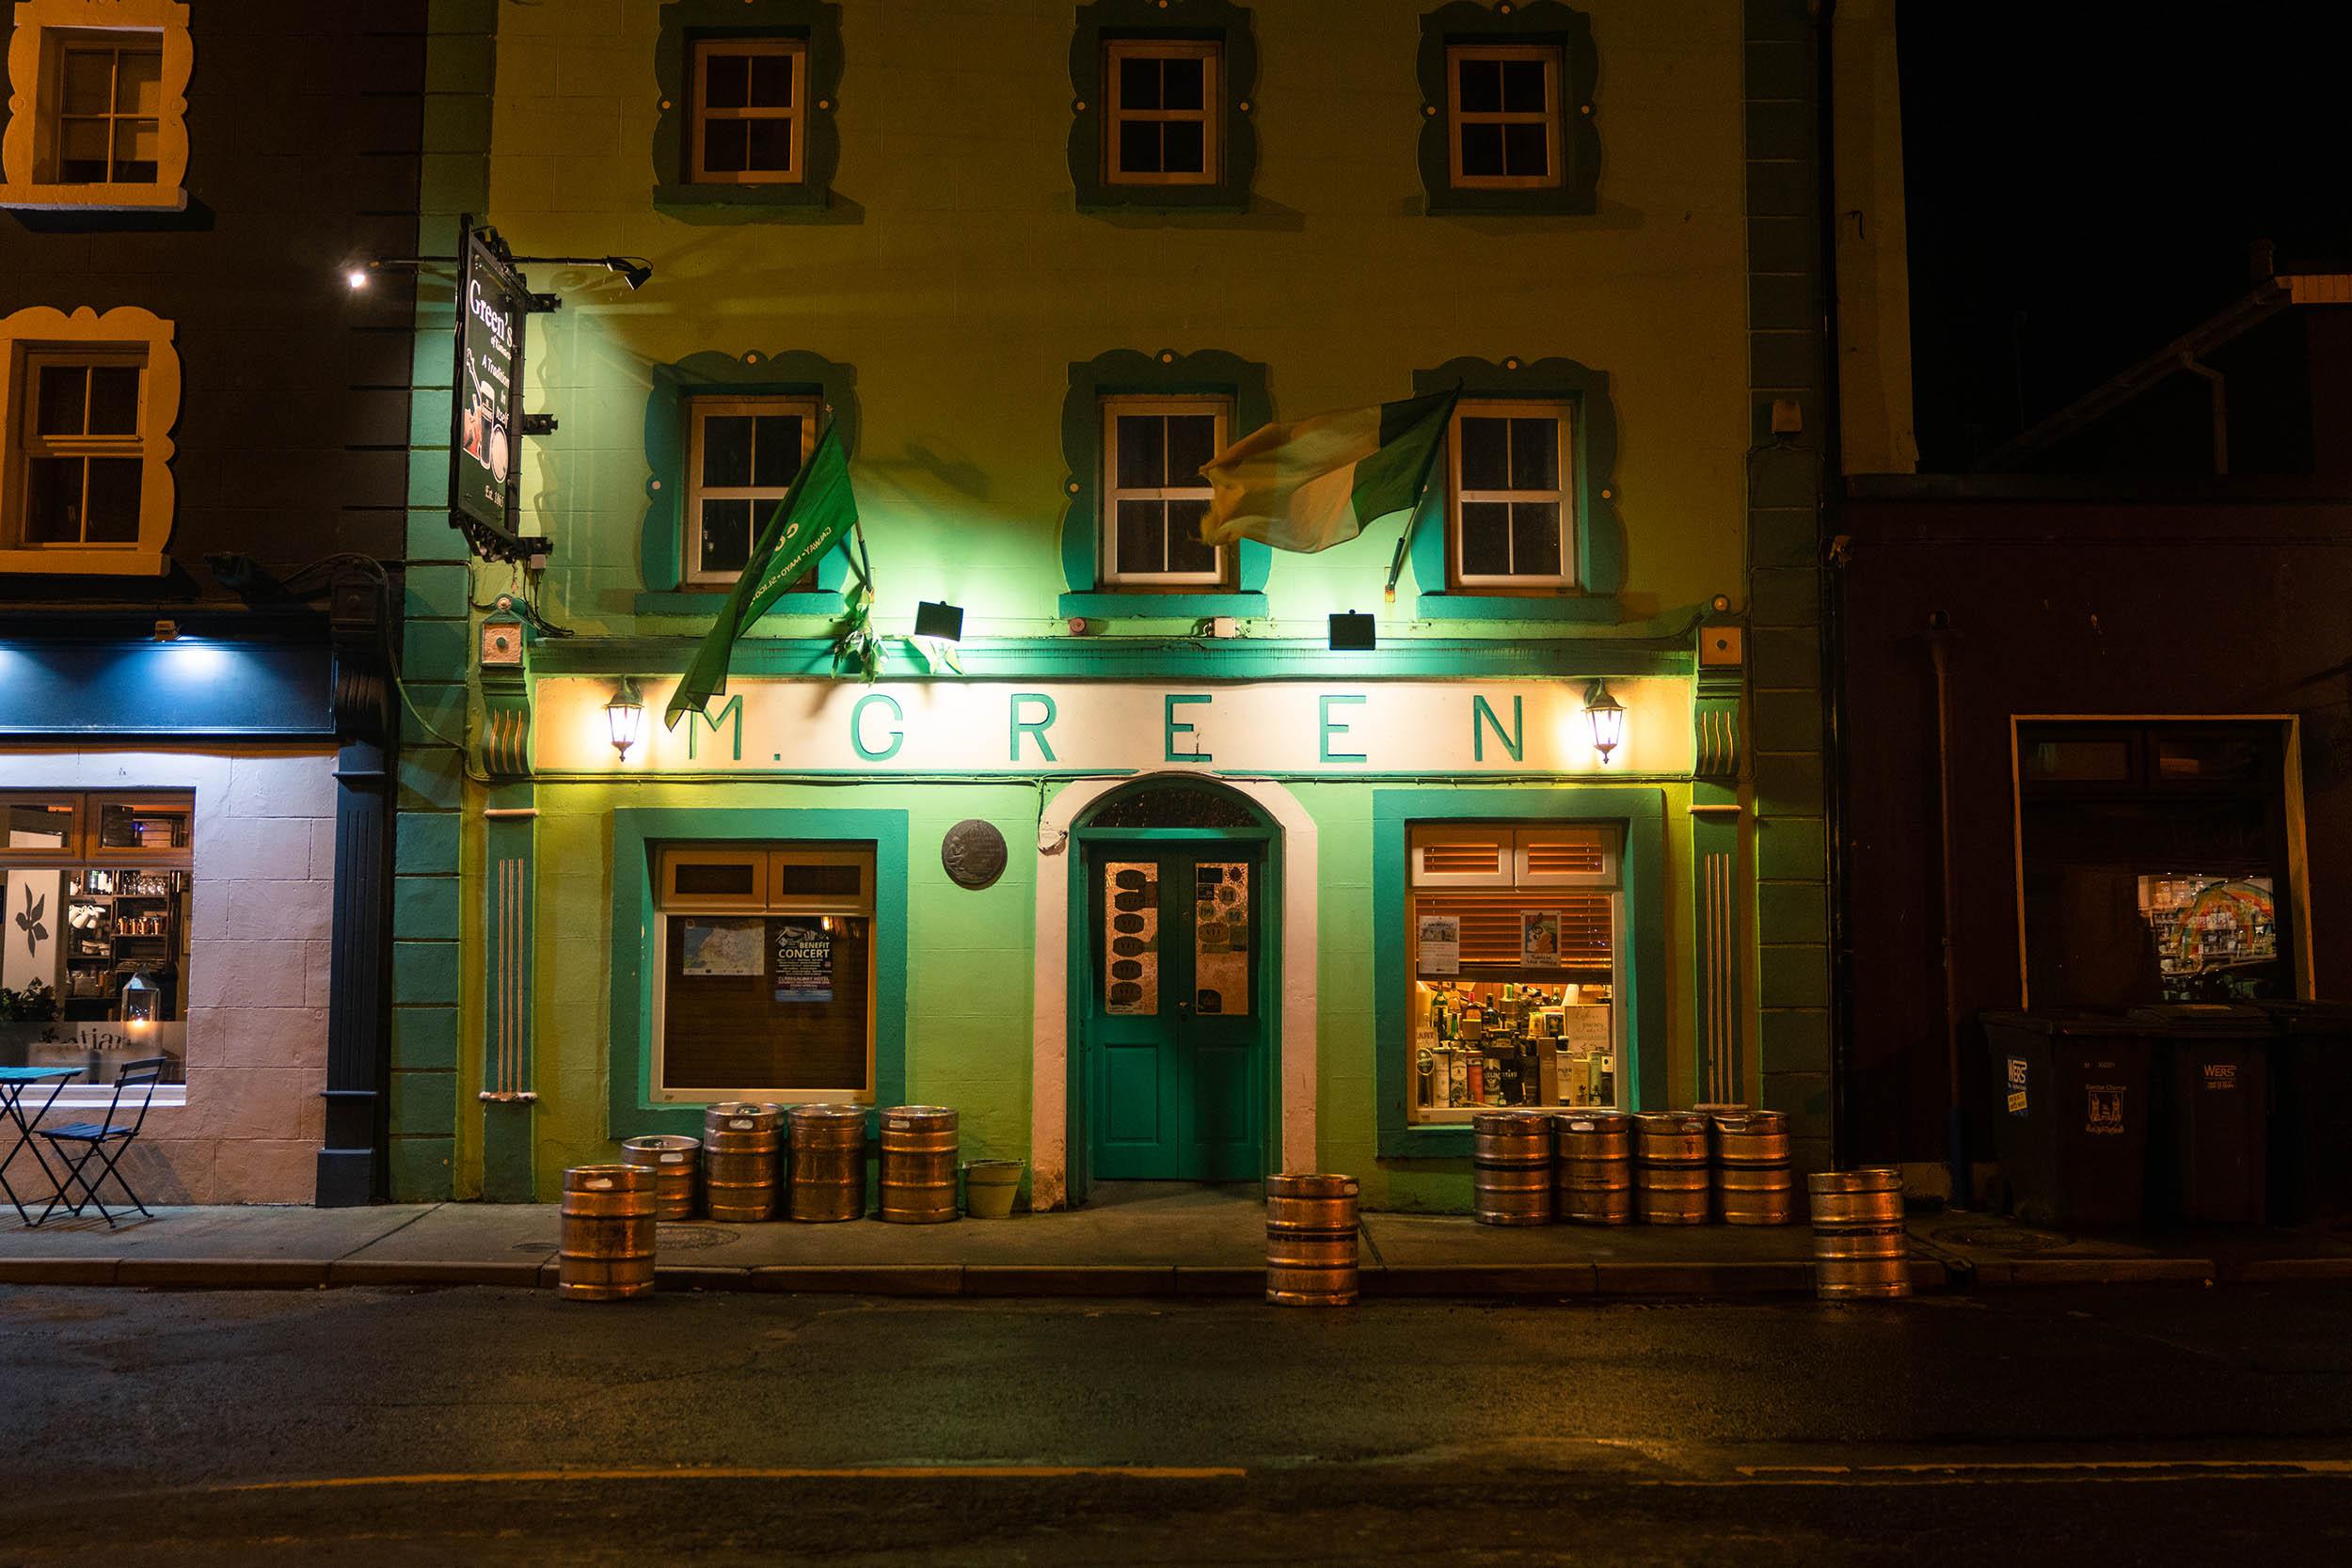 IRELAND_GALWAY_KINVARRA_0015